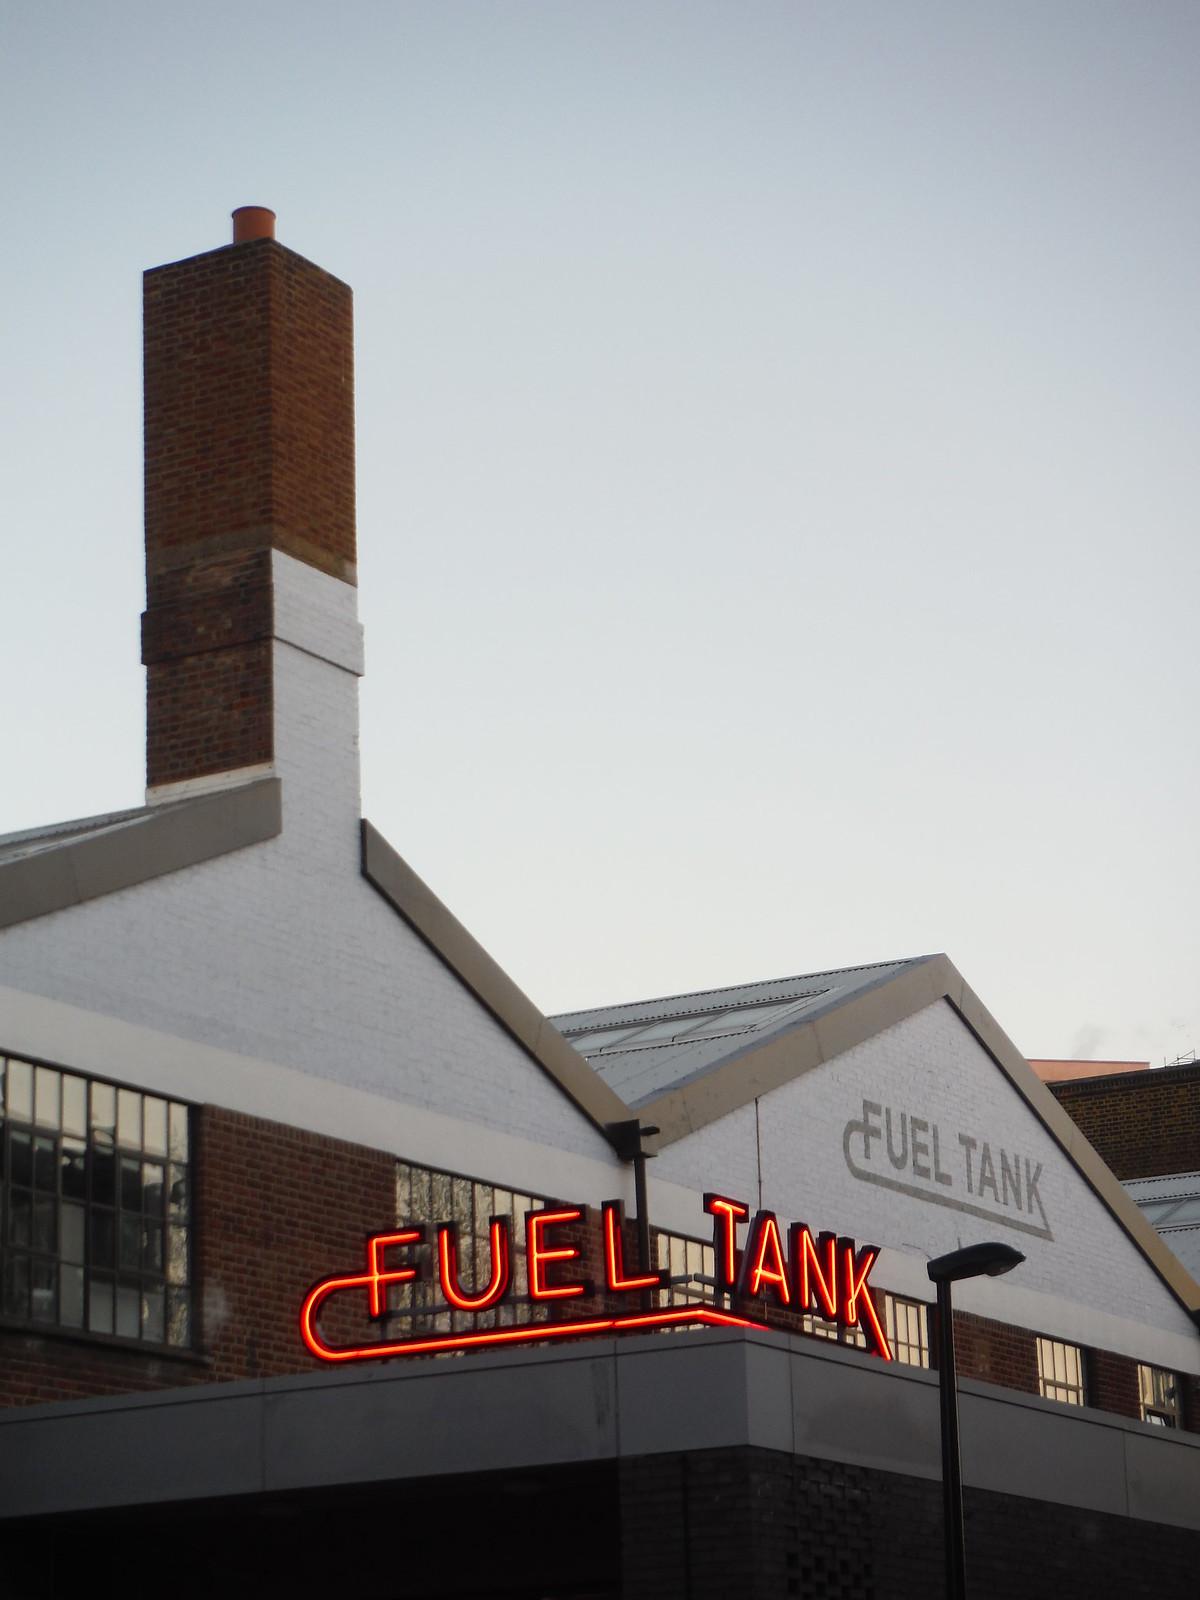 Fuel Tank Business Centre, Deptford Arts Quarter SWC Short Walk 36 - Waterlink Way (Lower Sydenham to Greenwich)